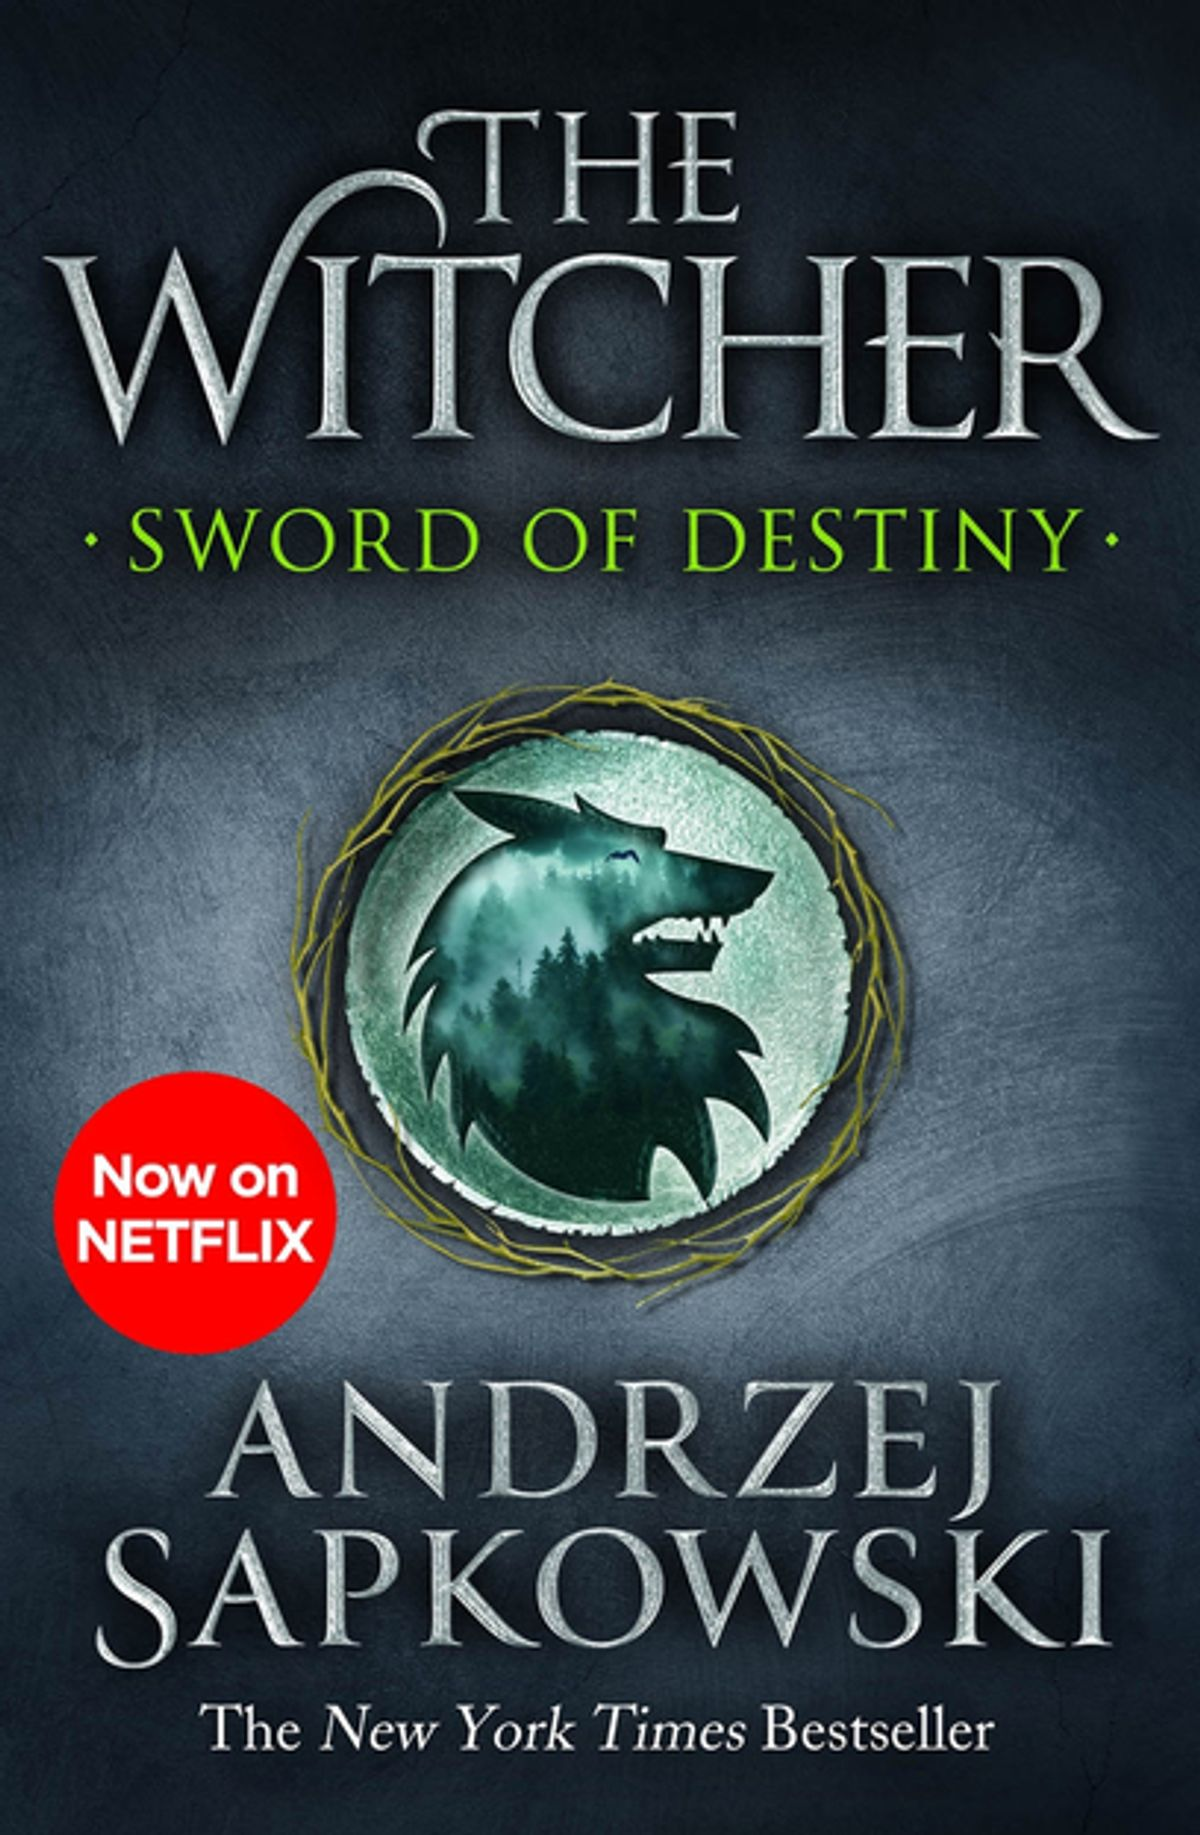 Sword of Destiny cover by Andrzej Sapkowski